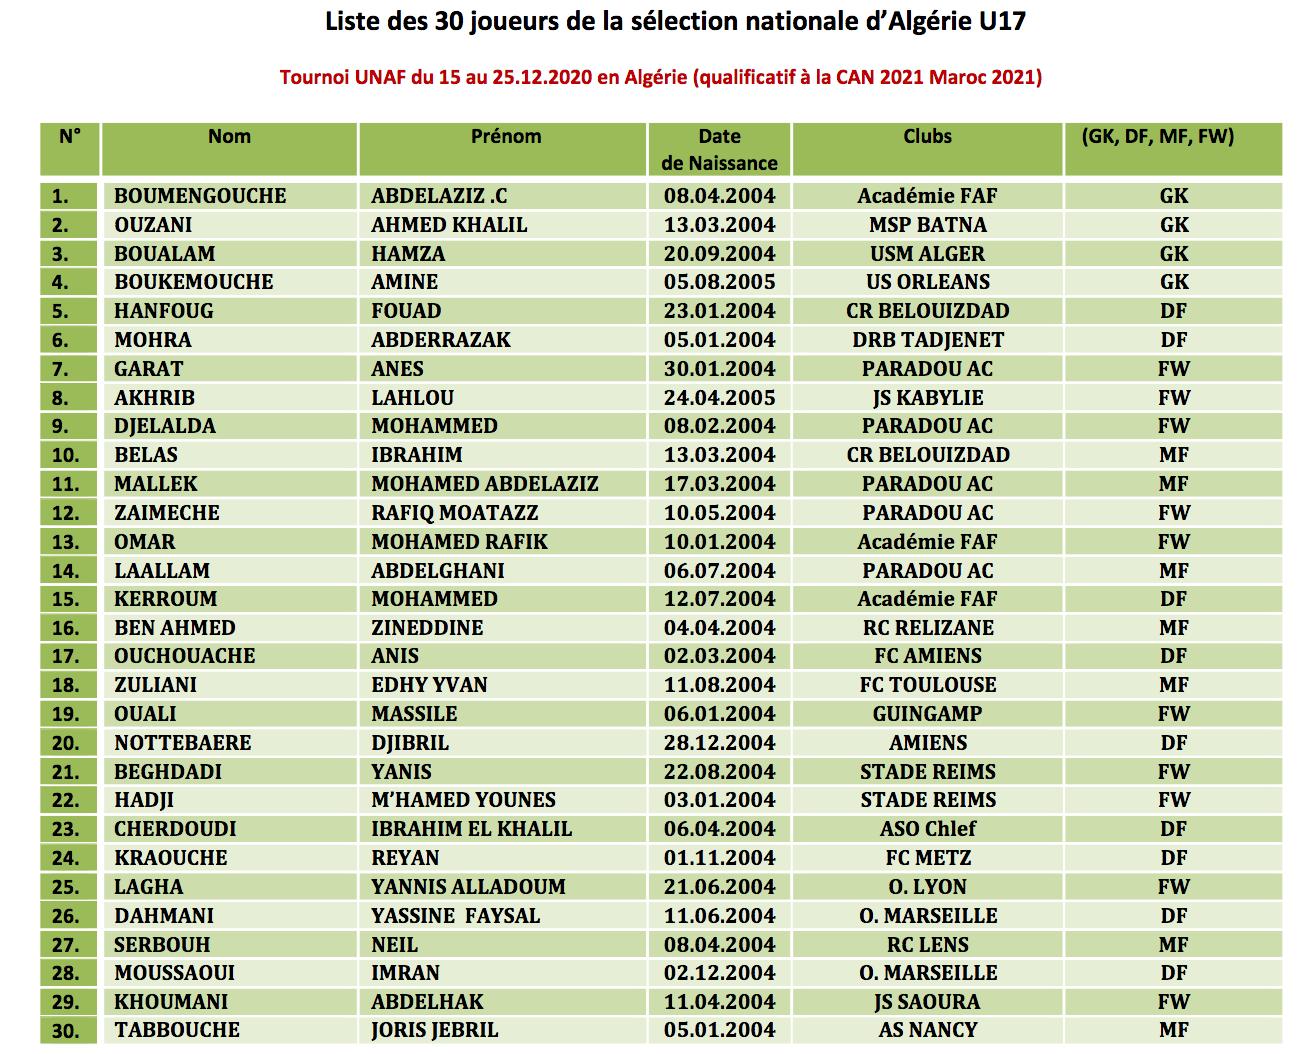 liste des U17 tournoi unaf 2021 janvier